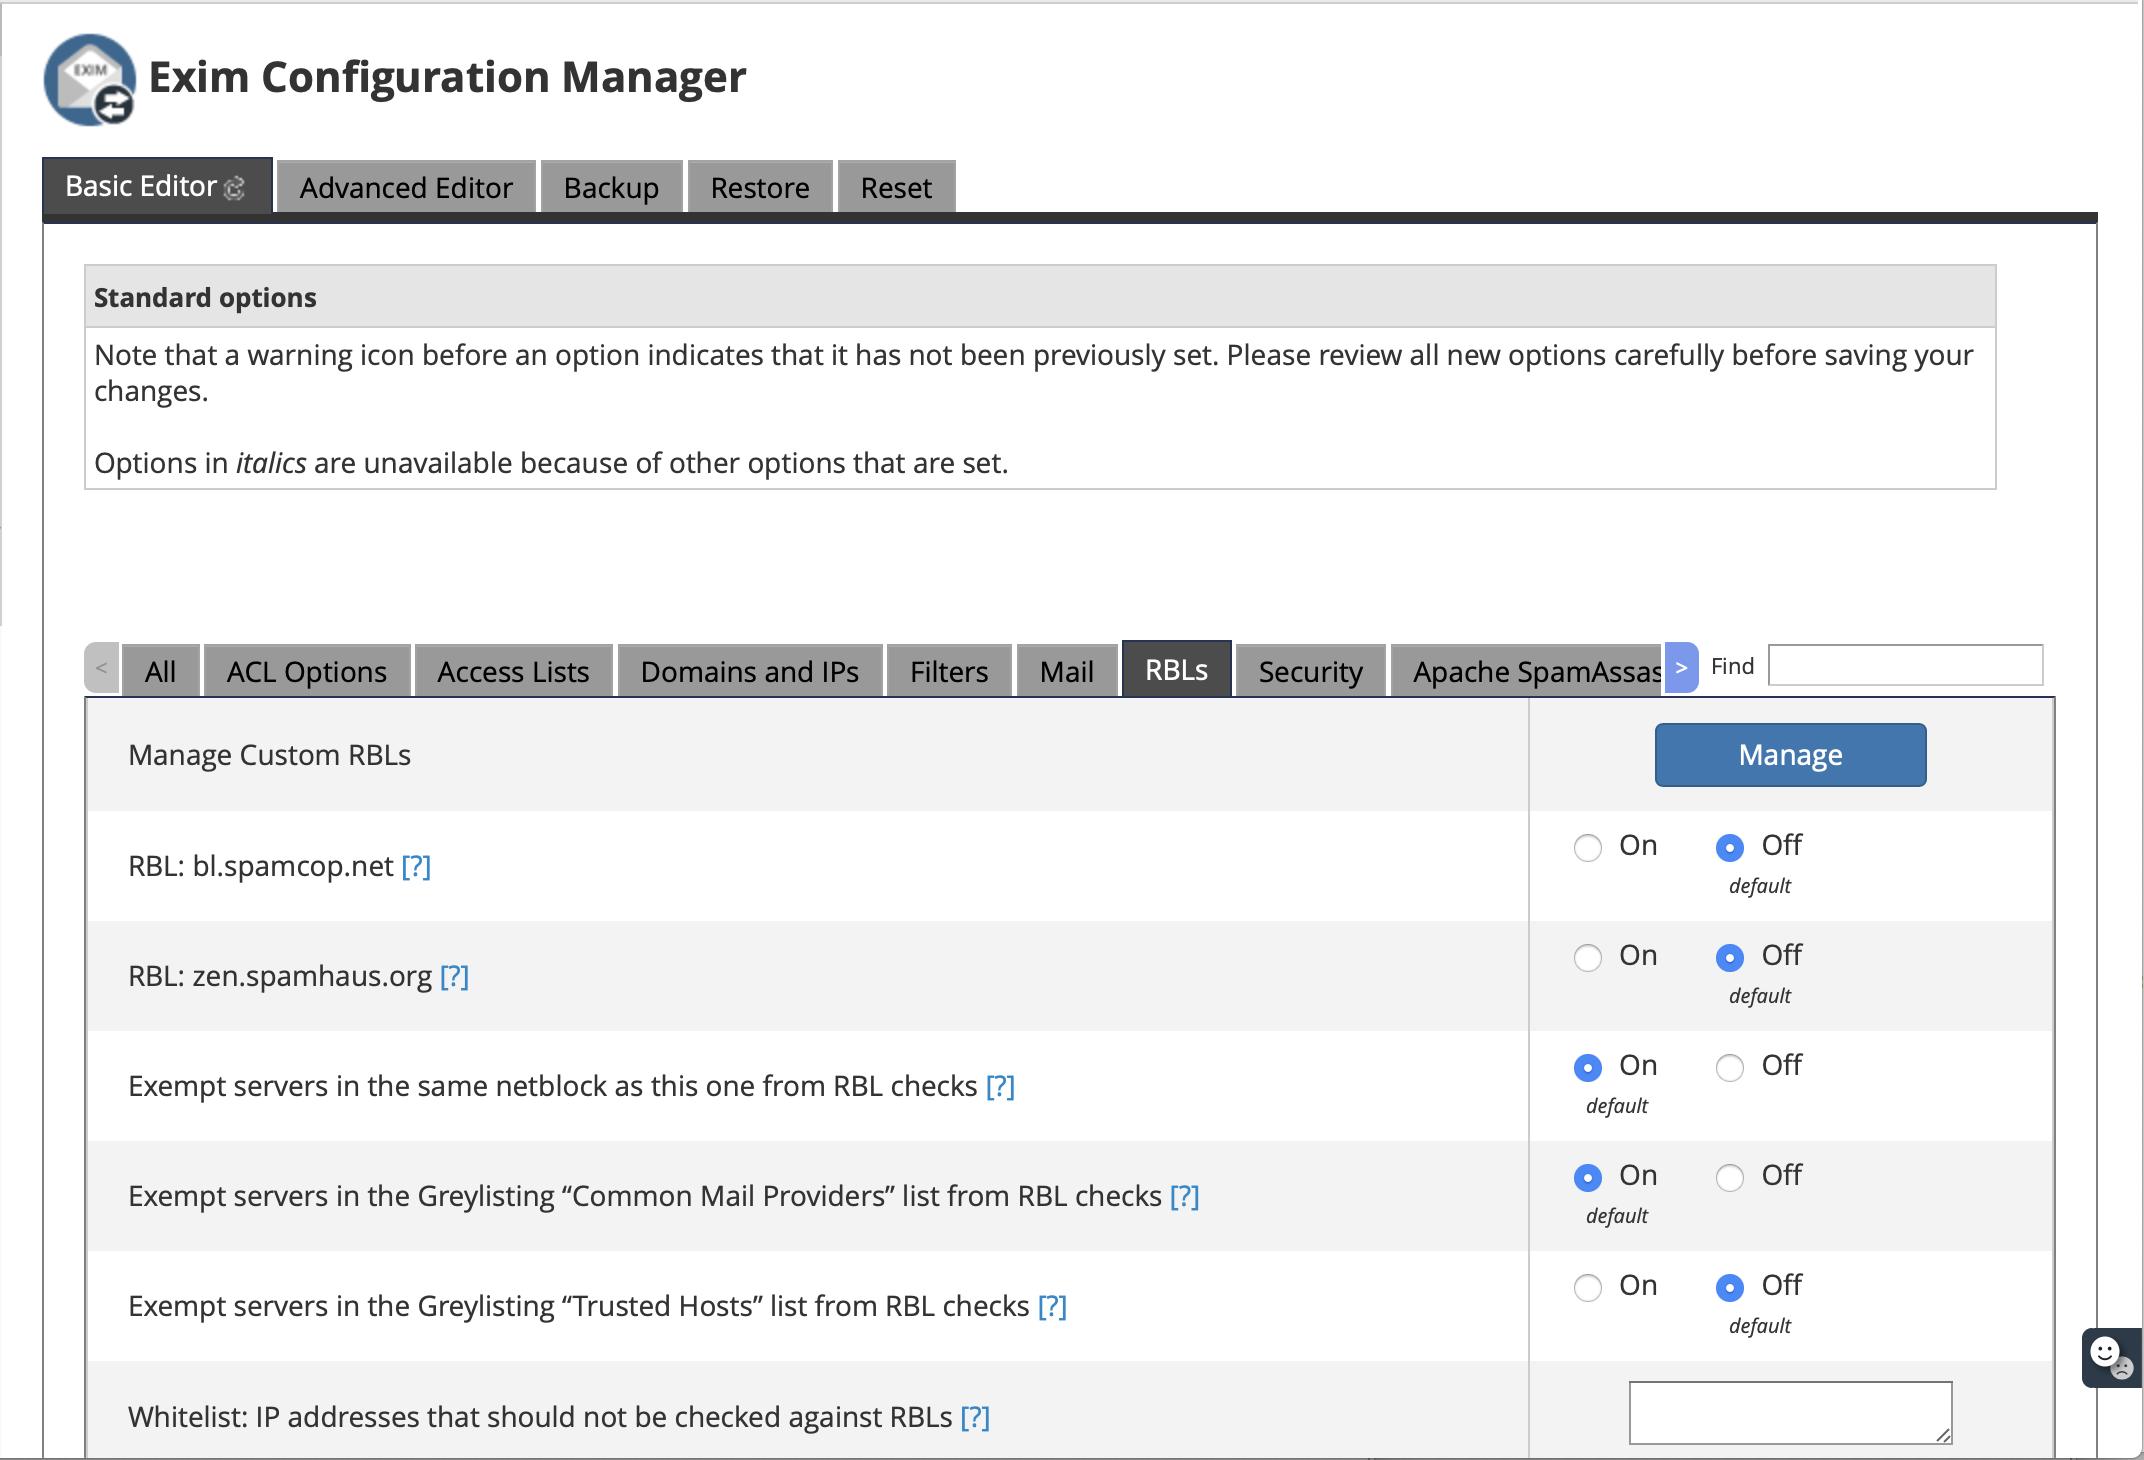 Exim Configuration Manager